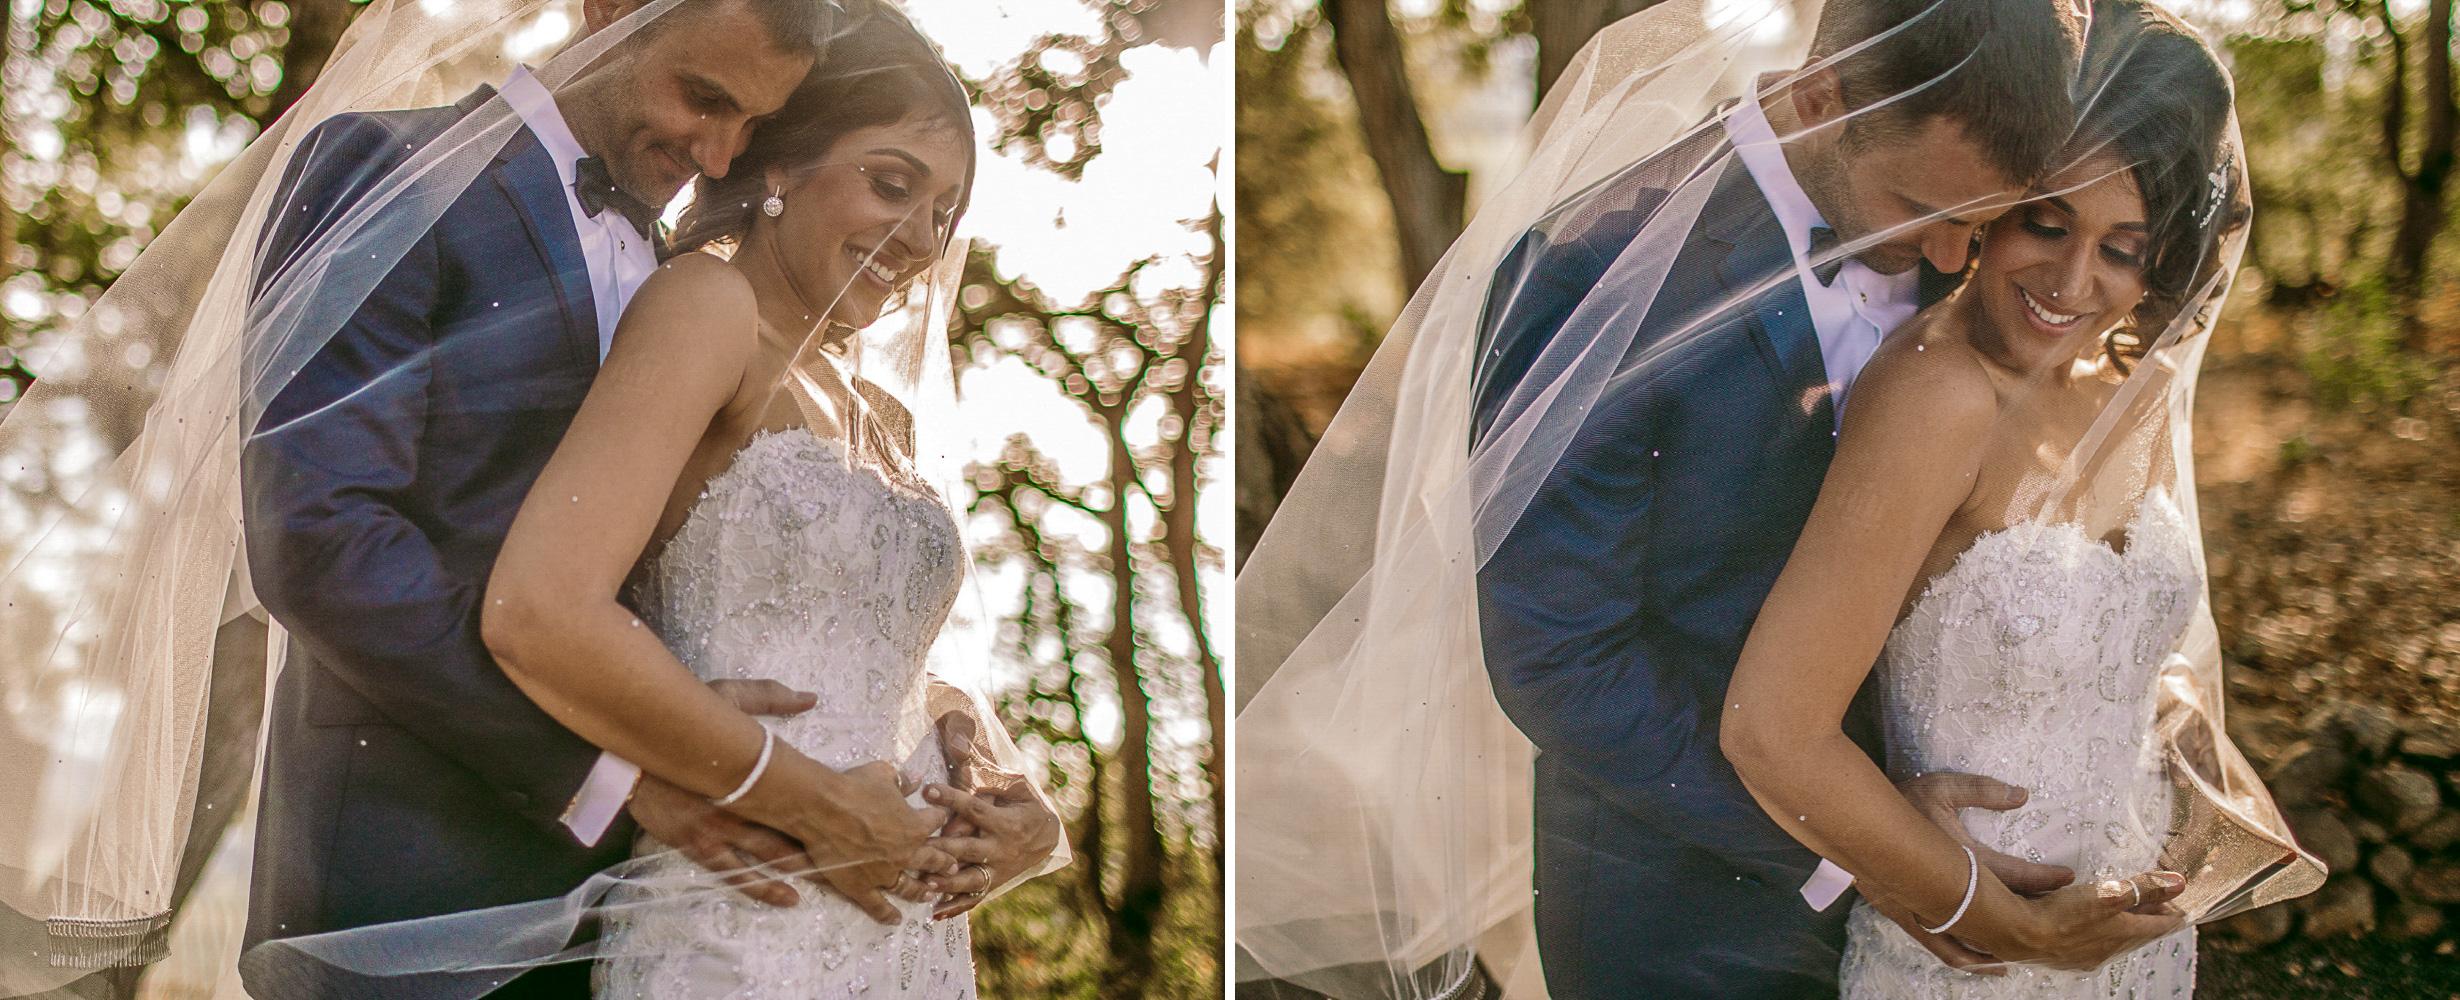 san diego wedding   photographer | groom holding bride from behind seen through veil